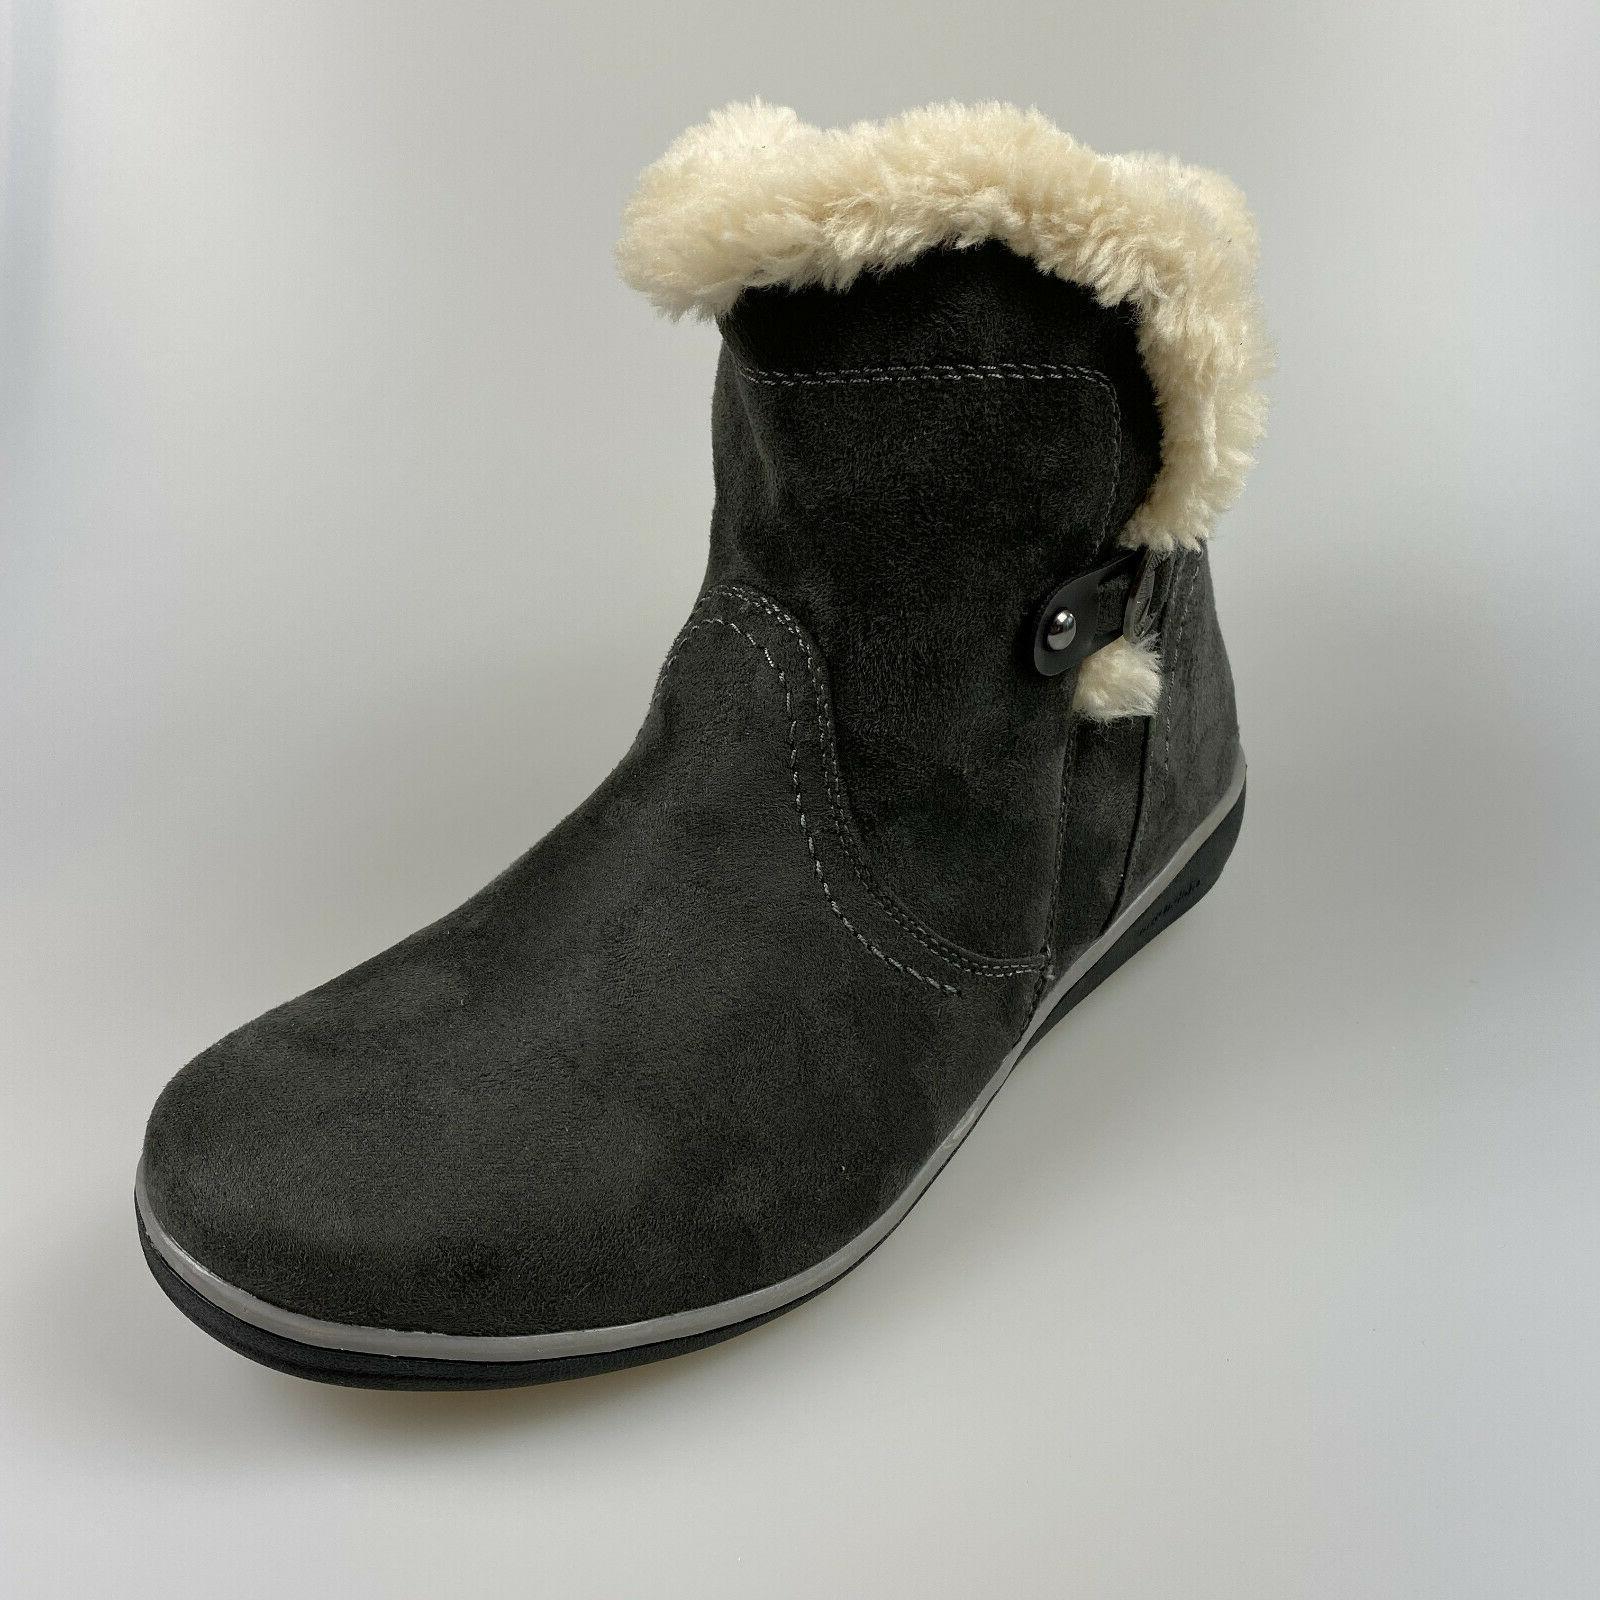 $69 NEW Women's 8 Suede Boots Feax Fur